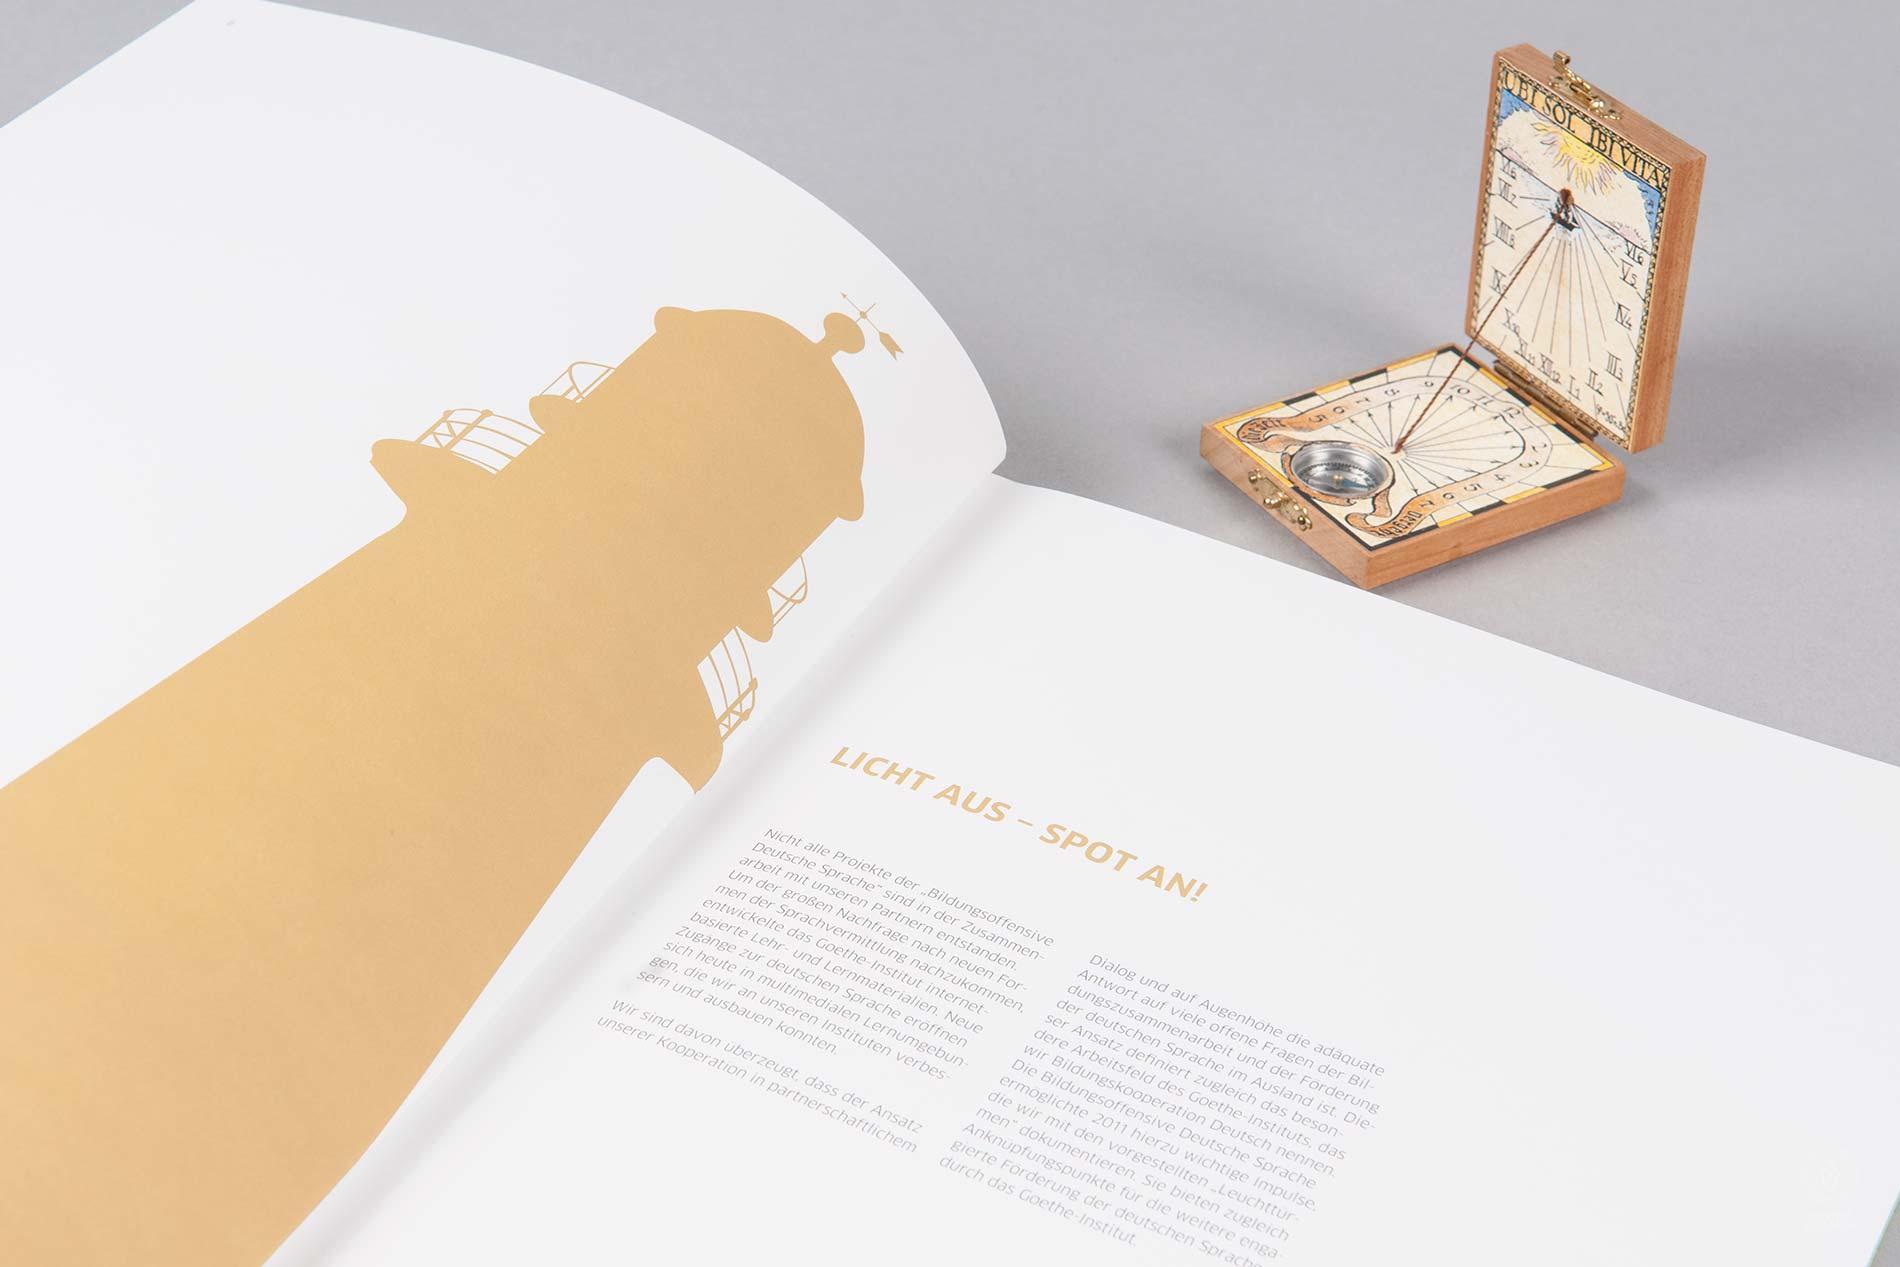 Janina-Lermer-Buchgestaltung-Magazingestaltung-Editorialdesign-intro-lighthouse-Goethe_Institut